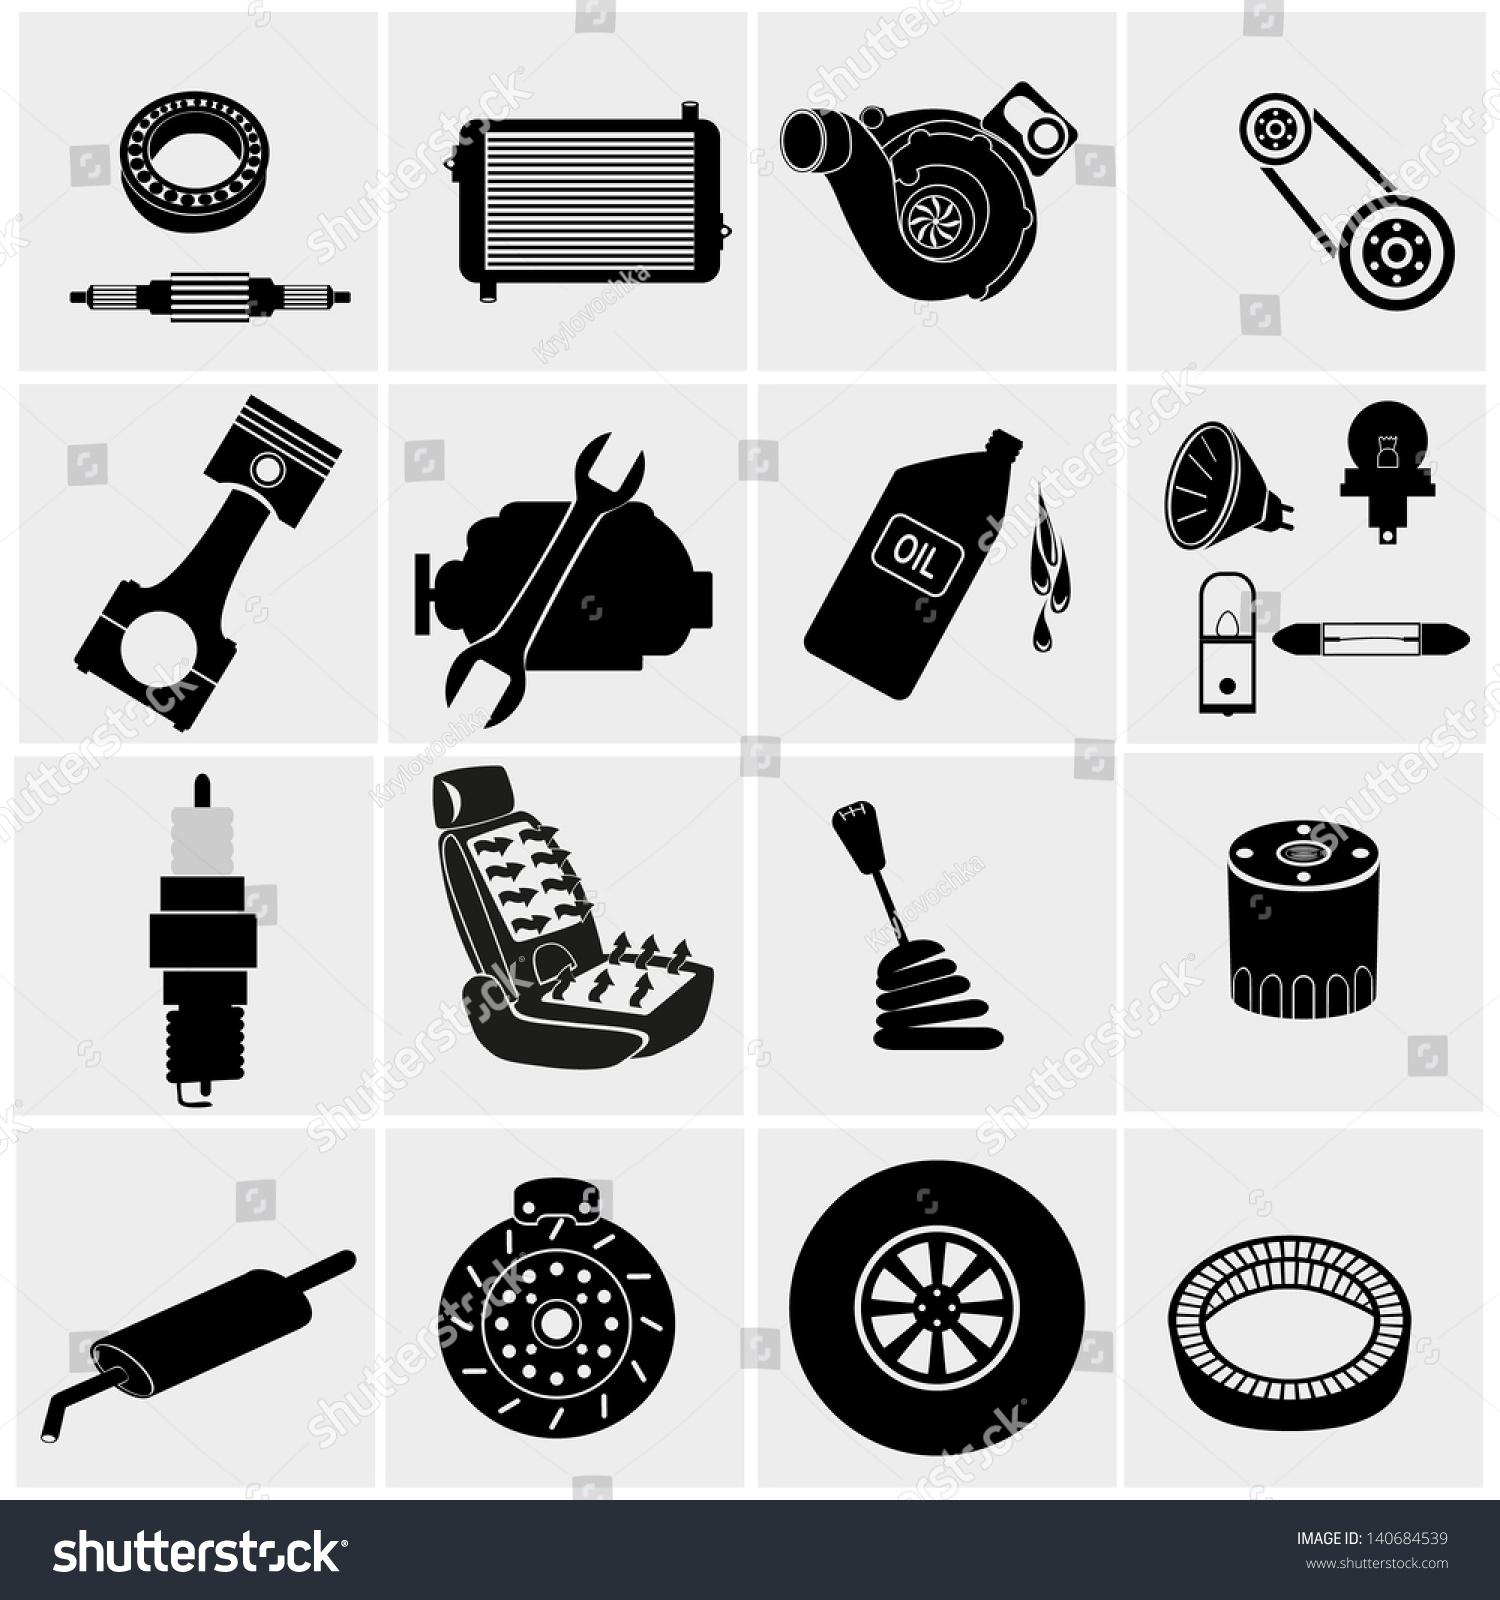 clipart mechanic tools - photo #46